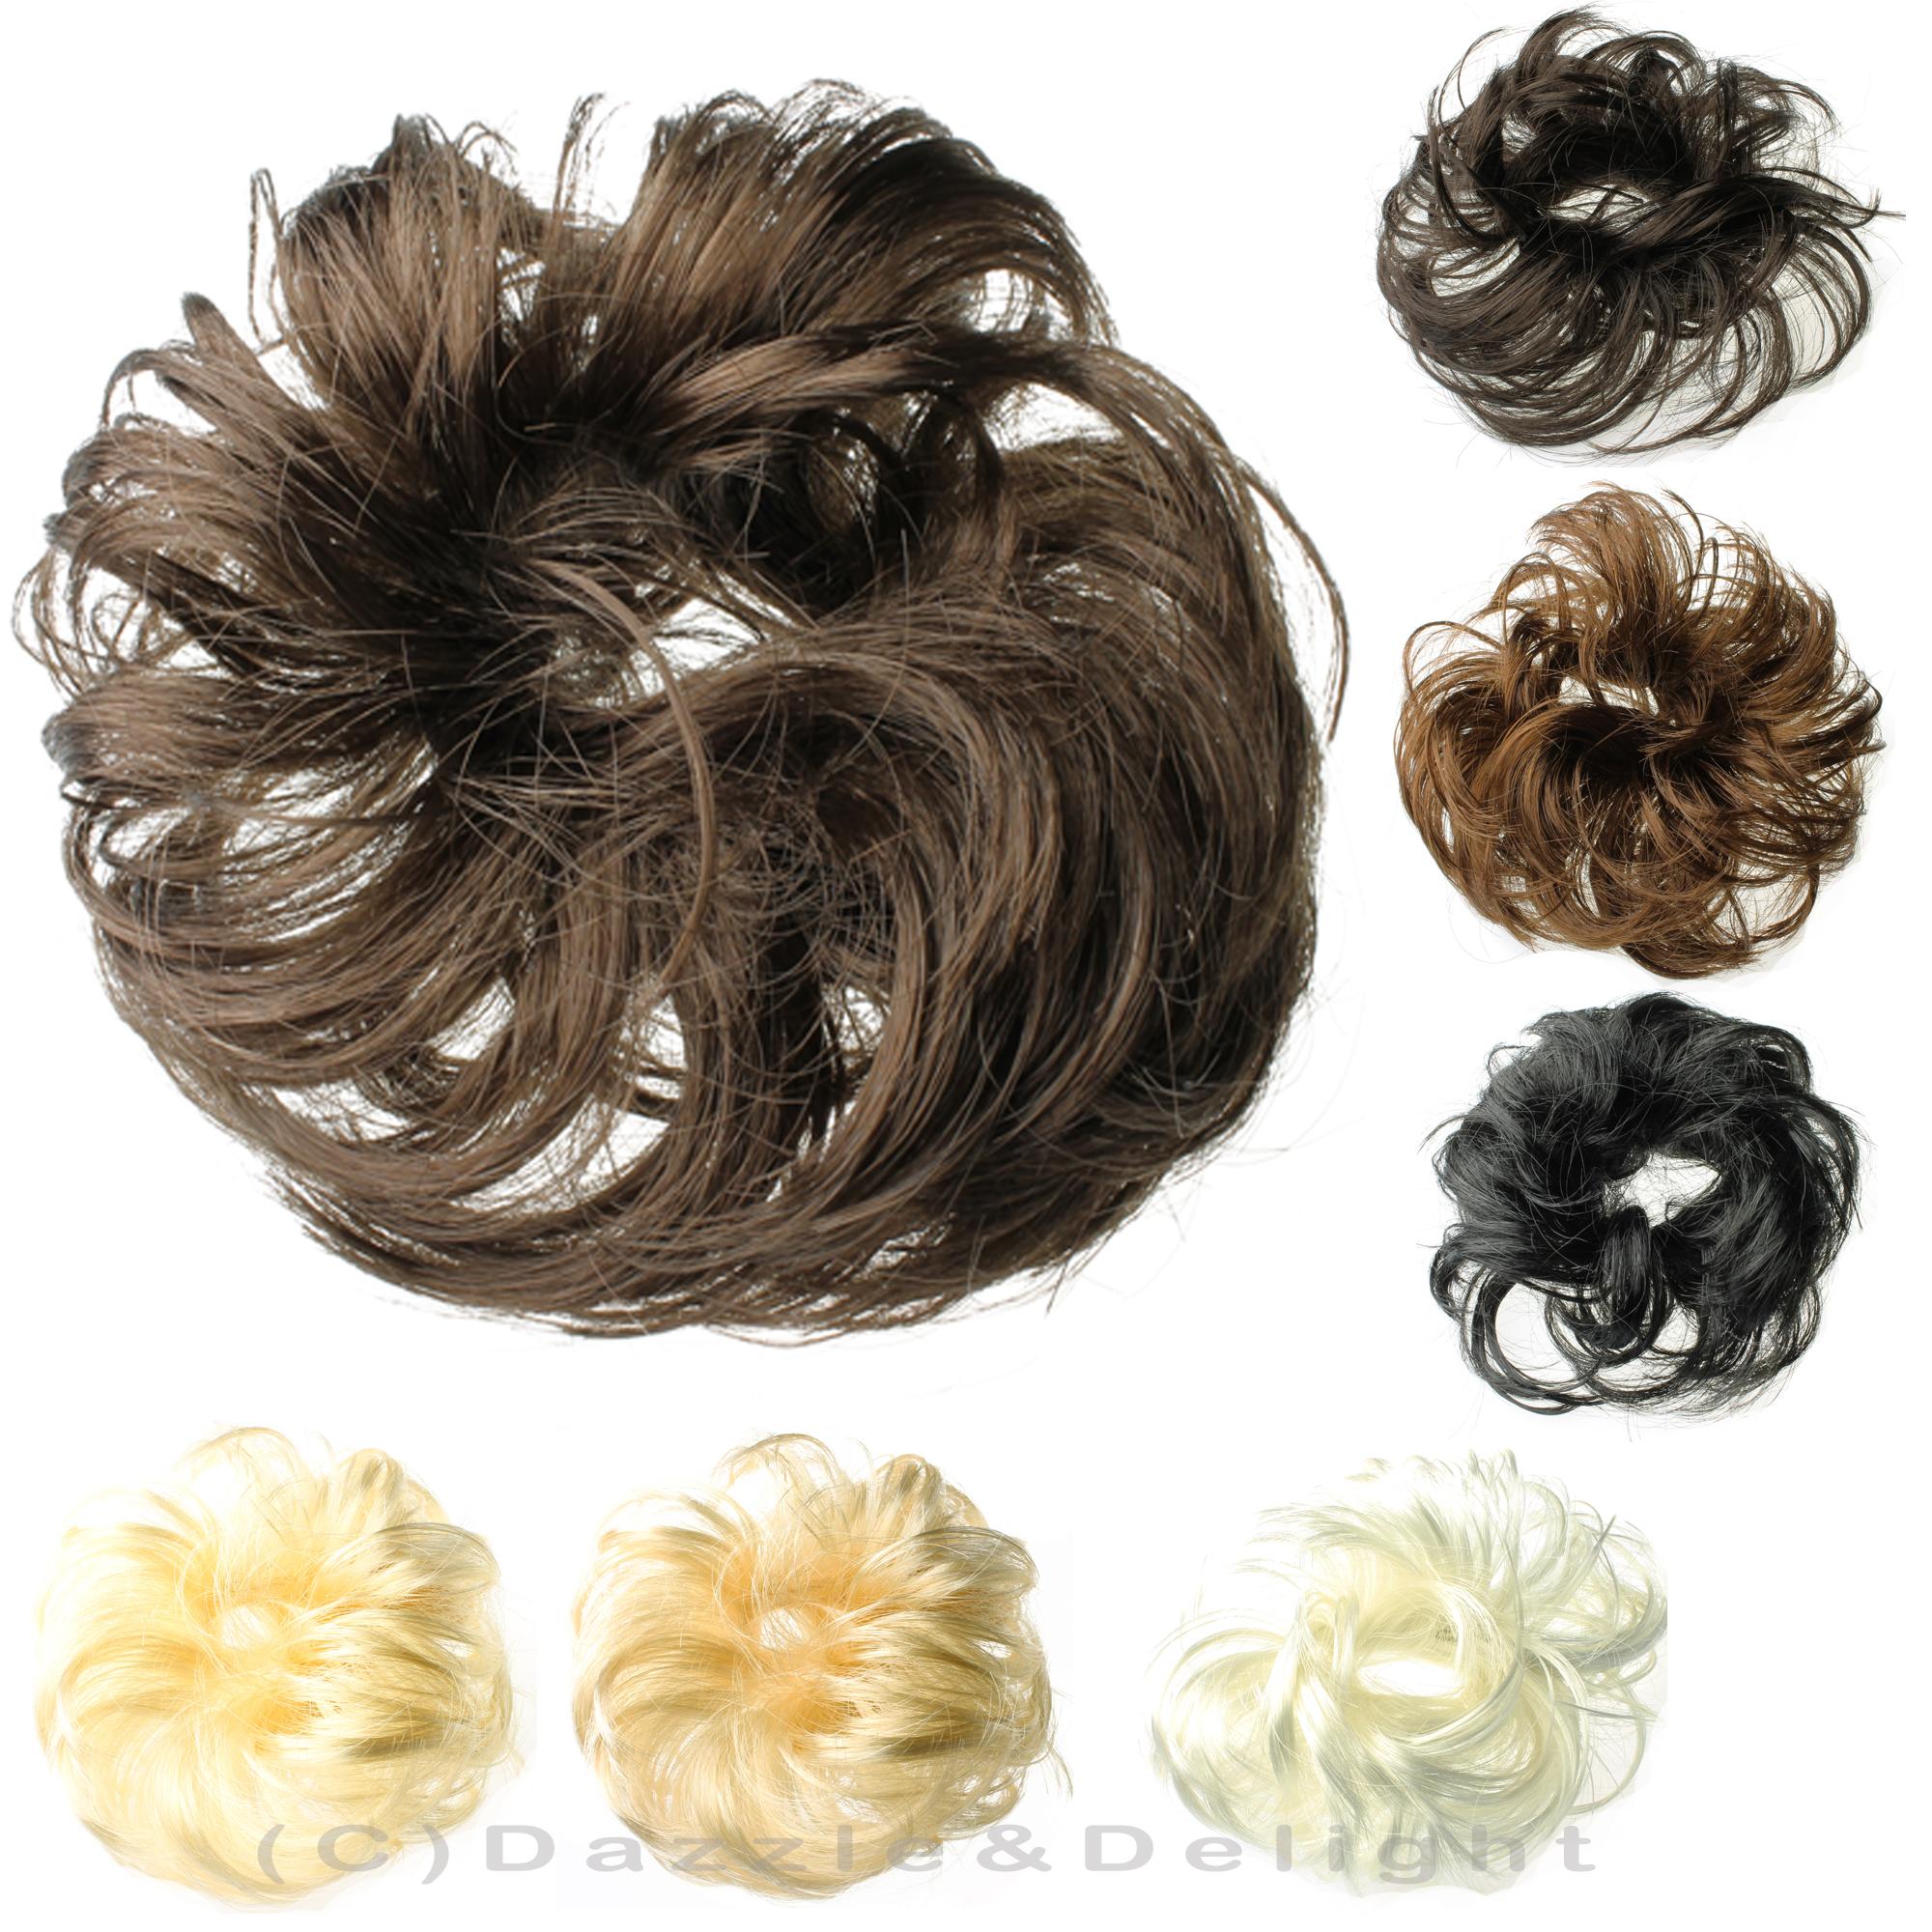 Prime Hair Scrunchies Synthetic Hair Scrunchie Brown Blonde Black Messy Short Hairstyles For Black Women Fulllsitofus